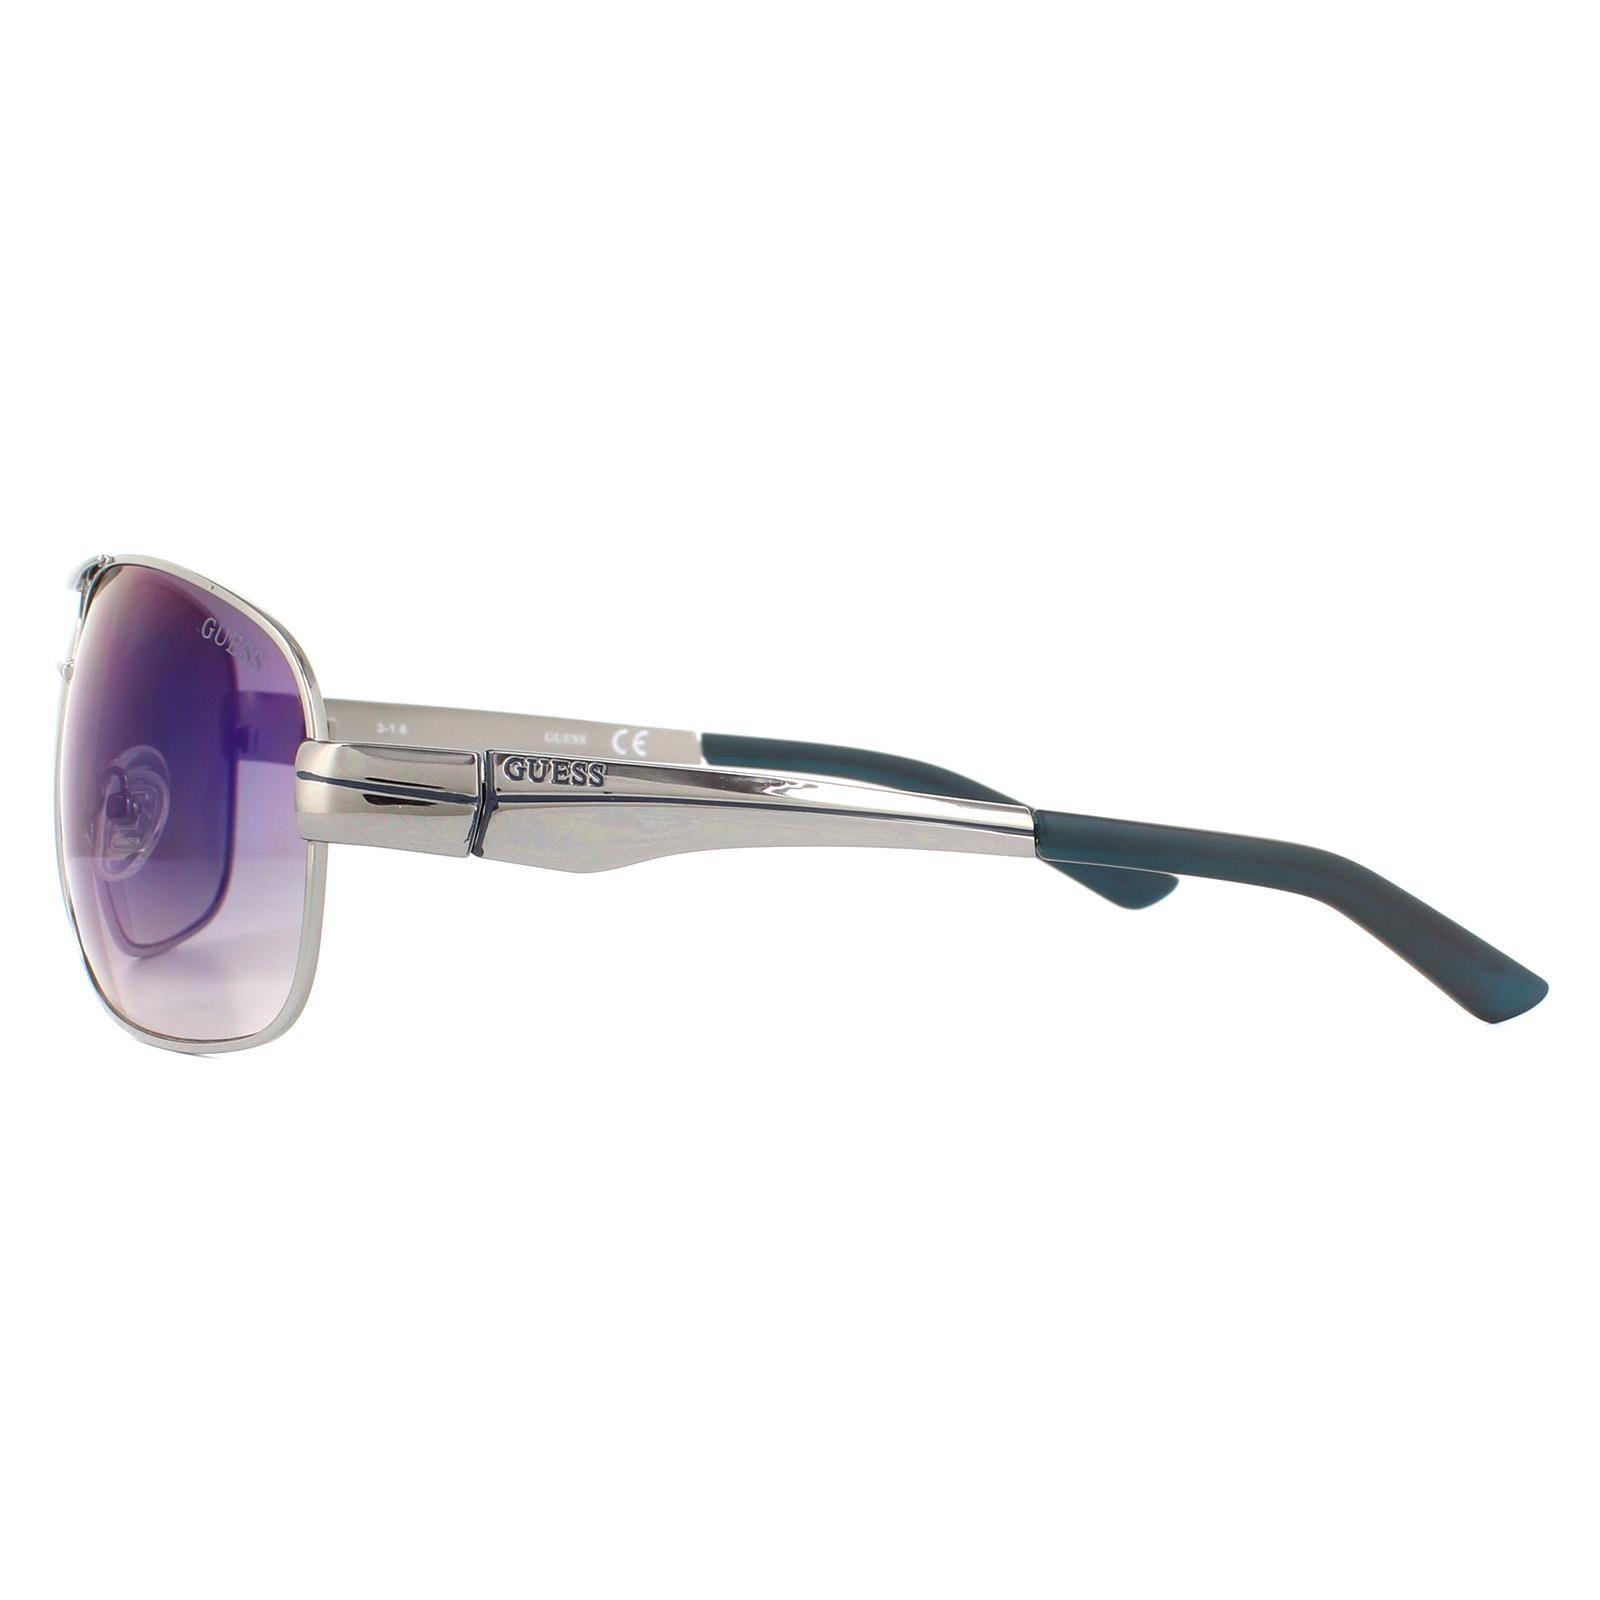 Guess Sunglasses GF5021 08X Silver Purple Polarized